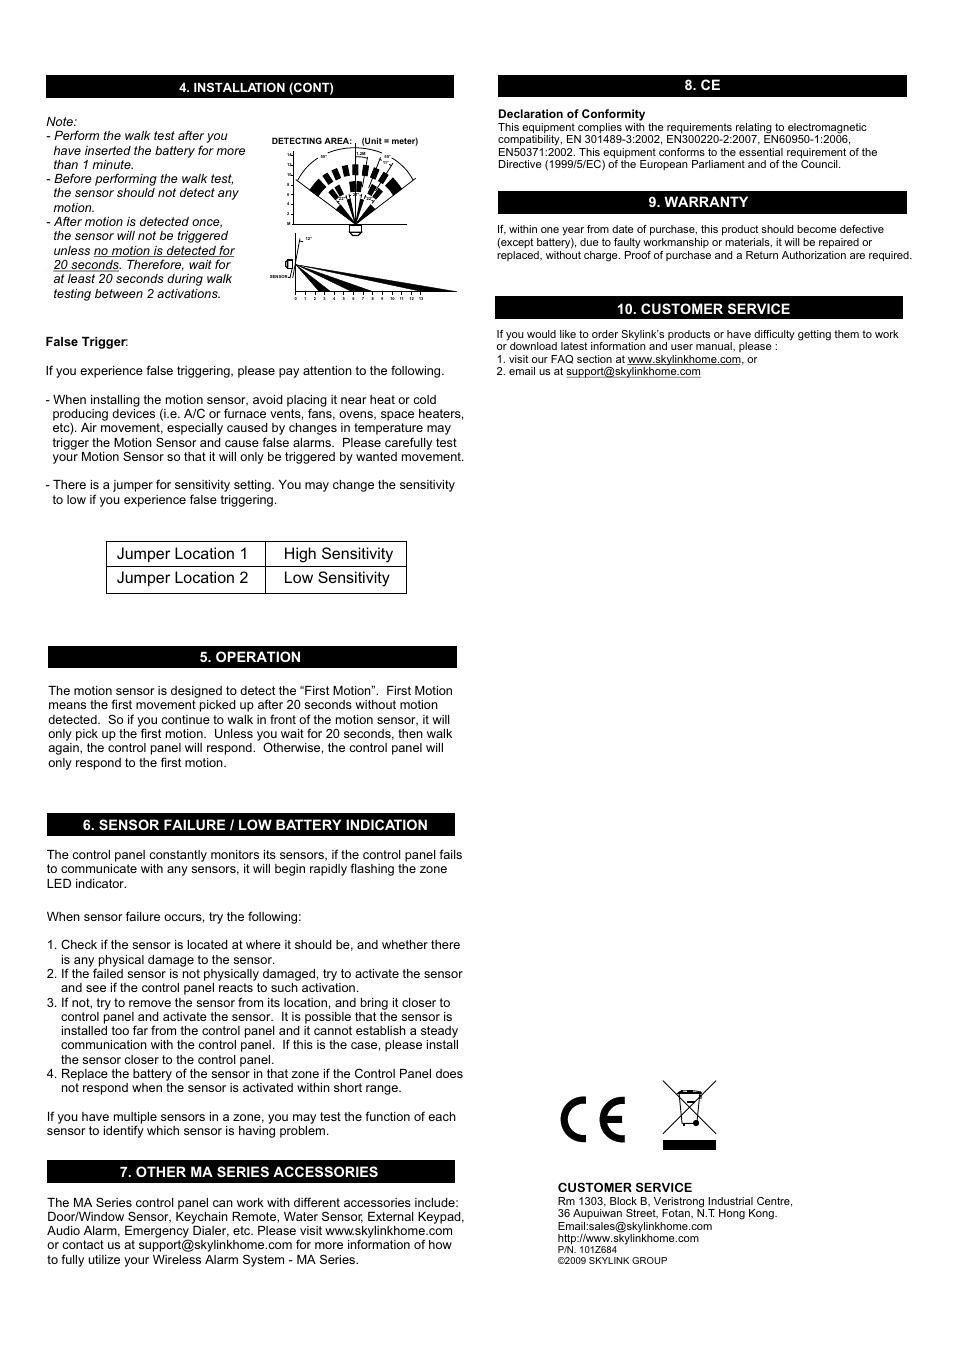 operation customer service installation cont skylink ps 103 rh manualsdir com Skylink Operator Skylink Vibration Sensor